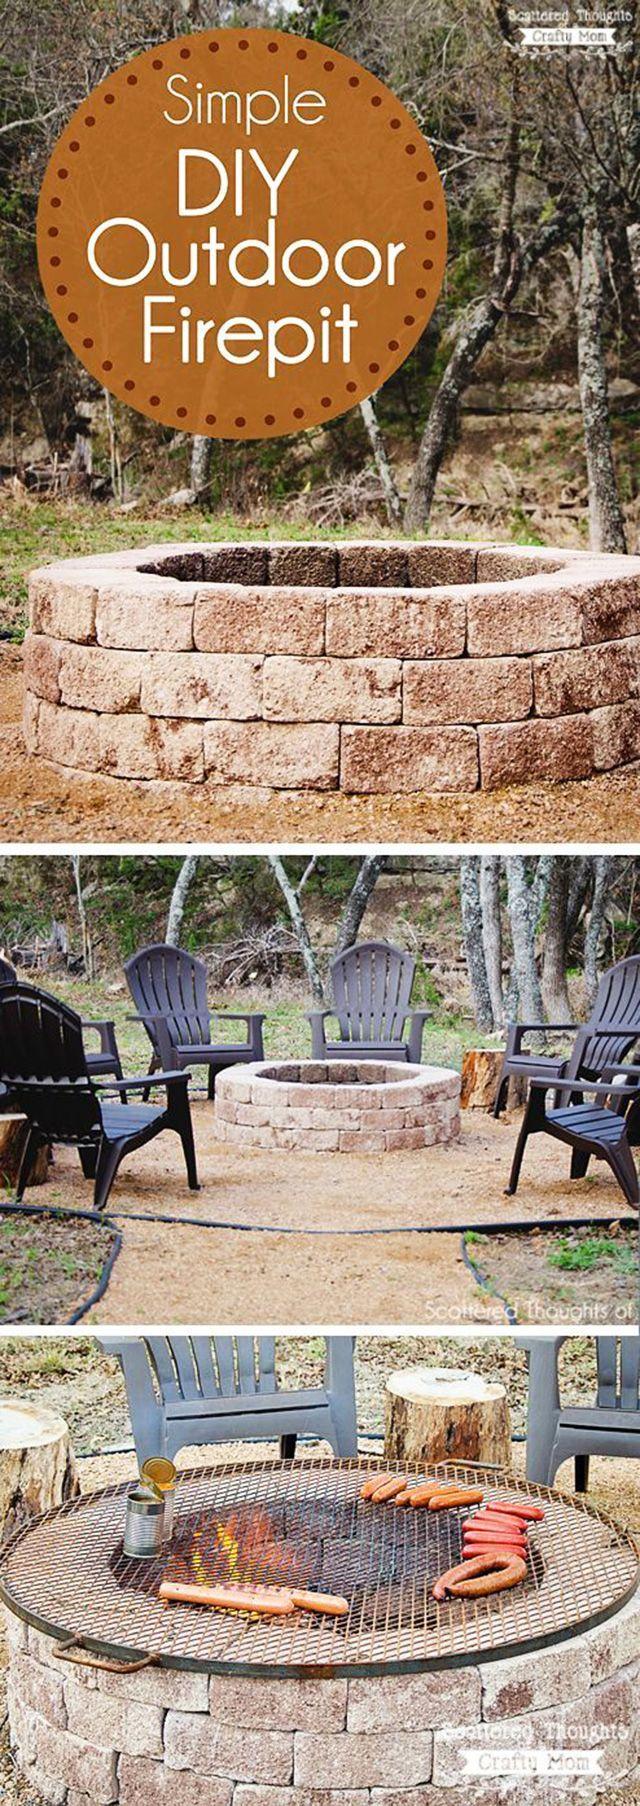 5 steps to building a backyard fire pit yards backyard and gardens